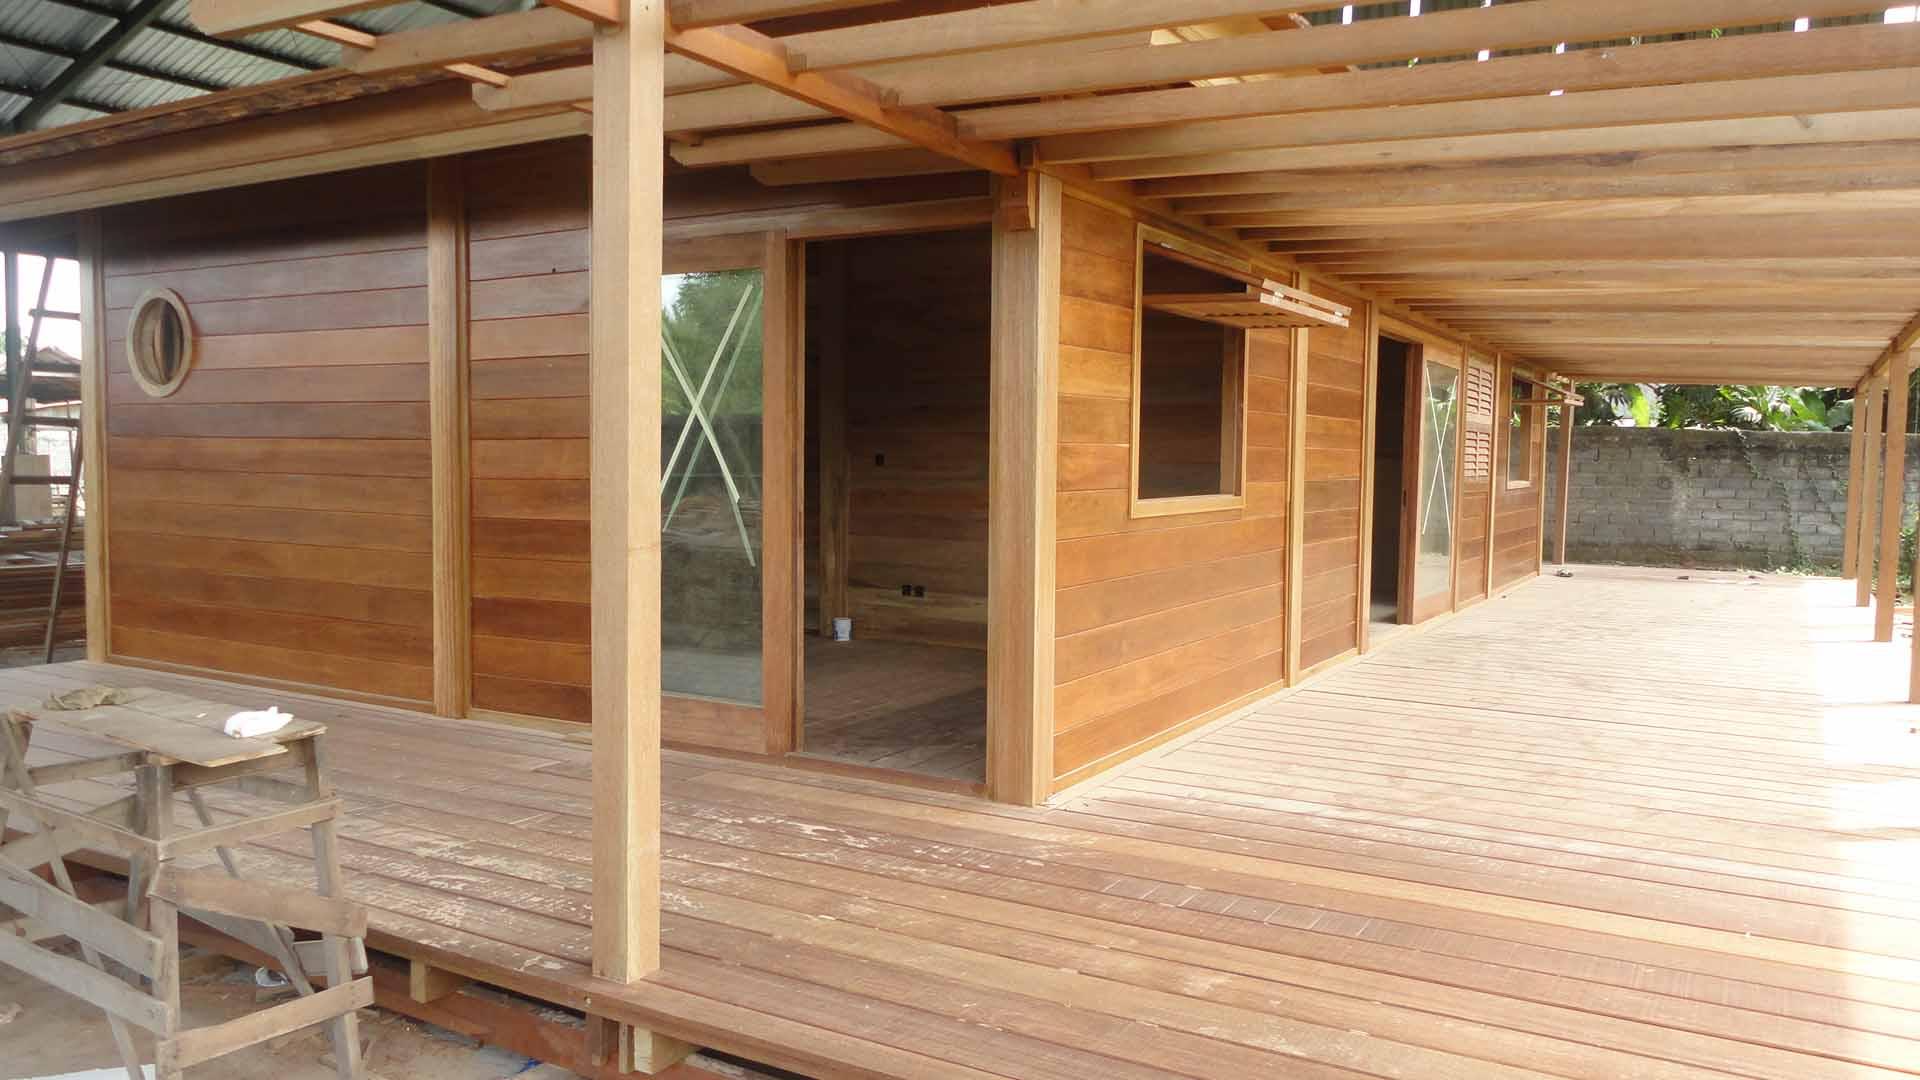 prix terrasse beton 20m2 modern kuchyn v trendy. Black Bedroom Furniture Sets. Home Design Ideas